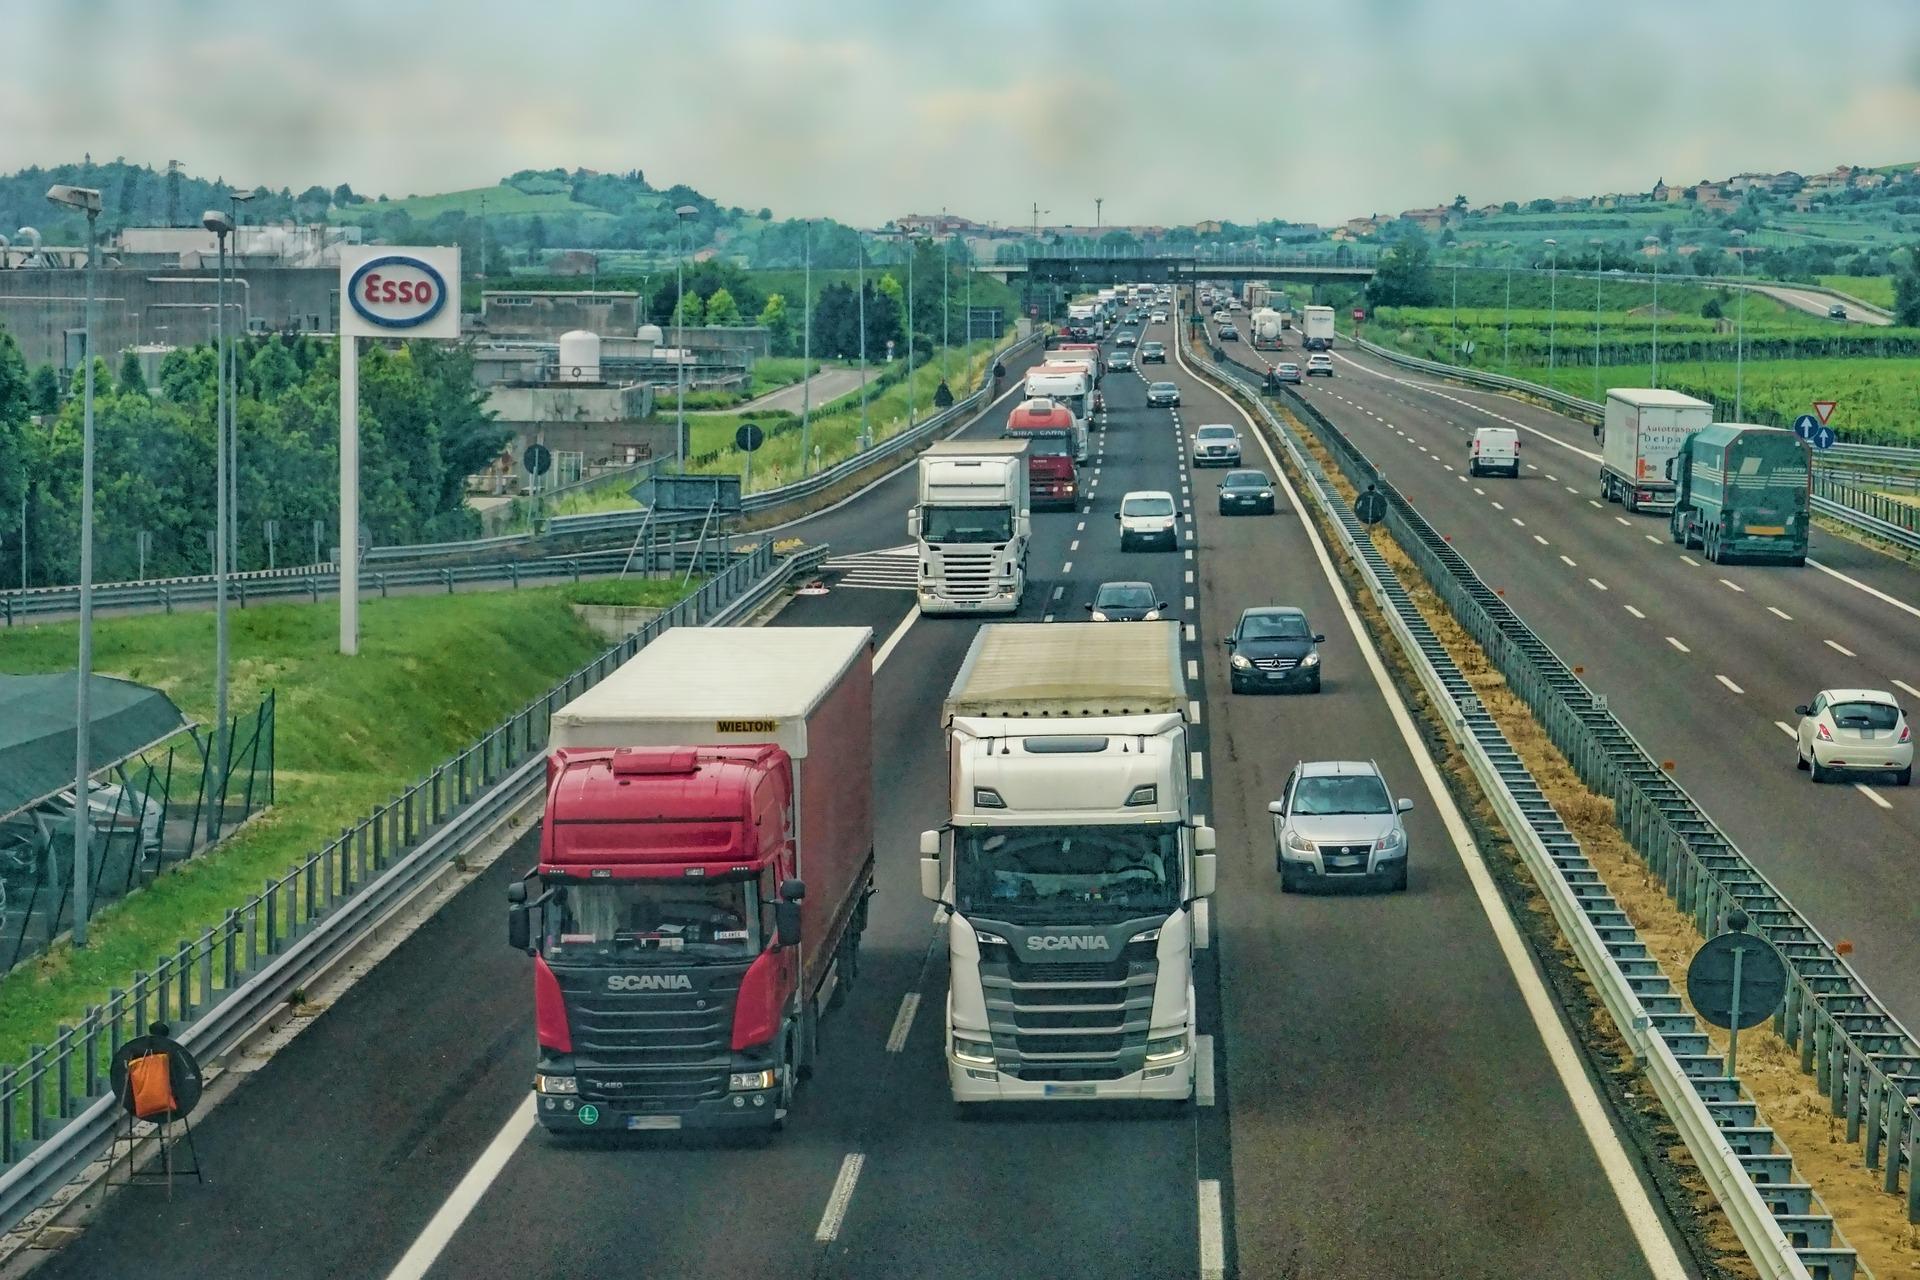 HGV trucks on motorway